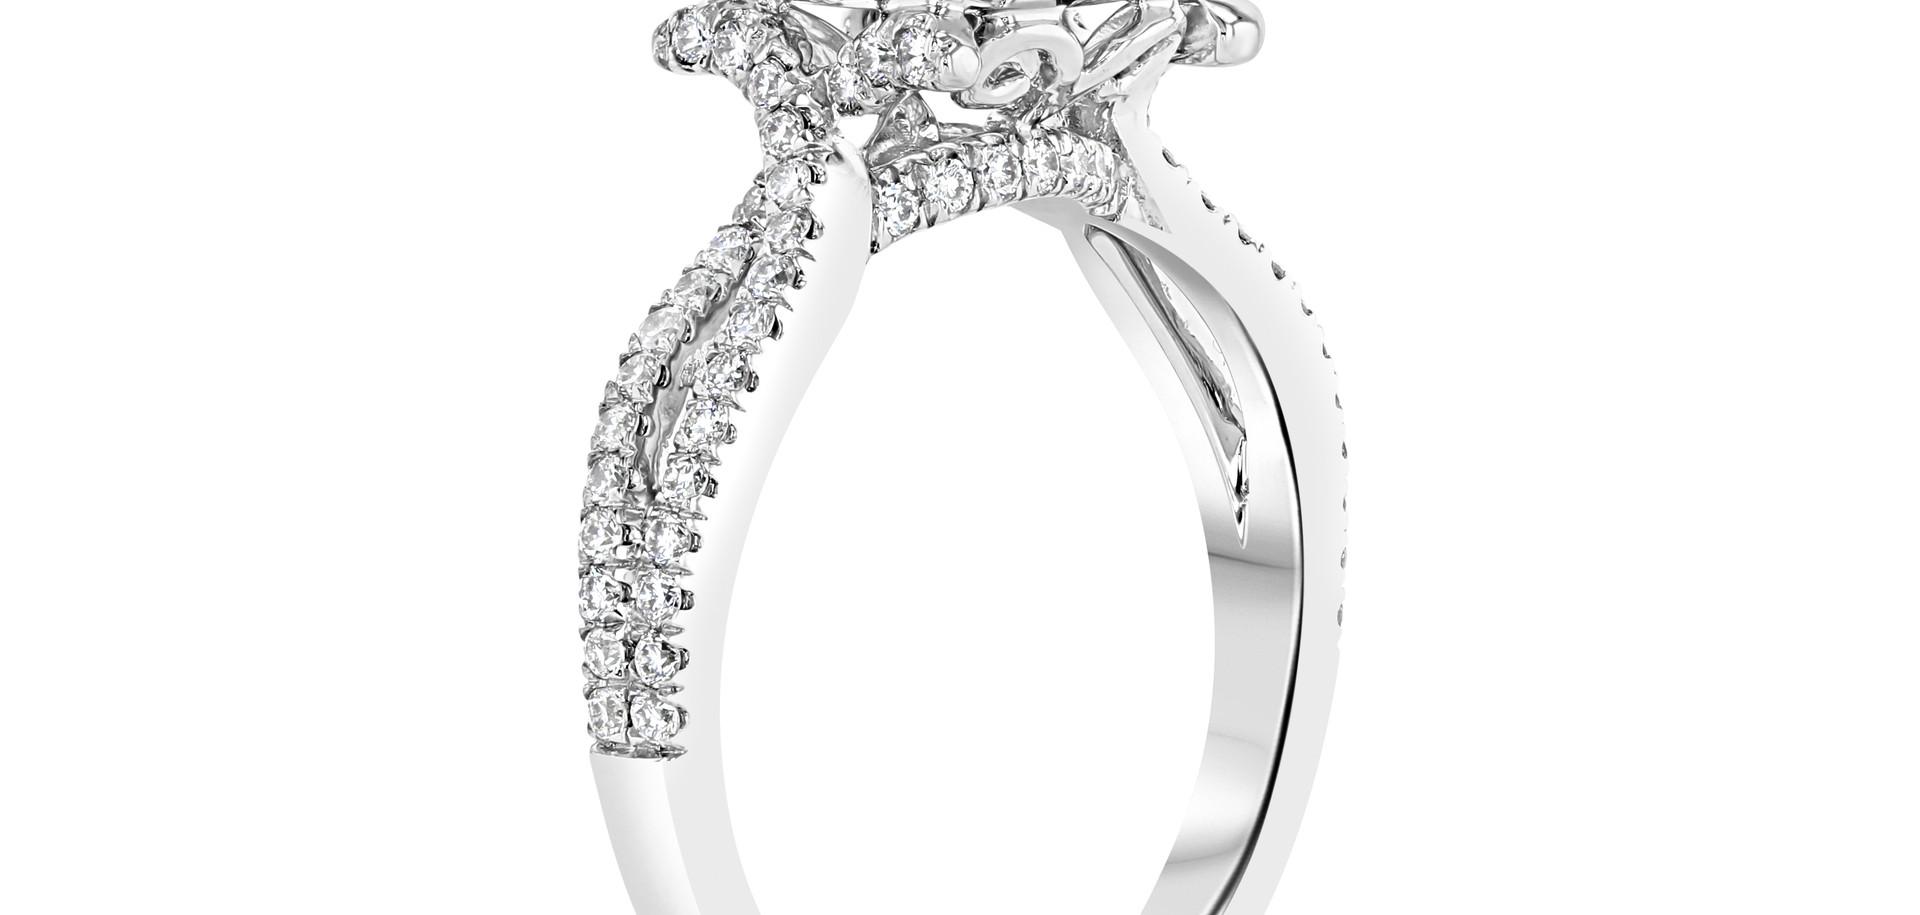 Copy of Engagement Ring 3_b0.JPG